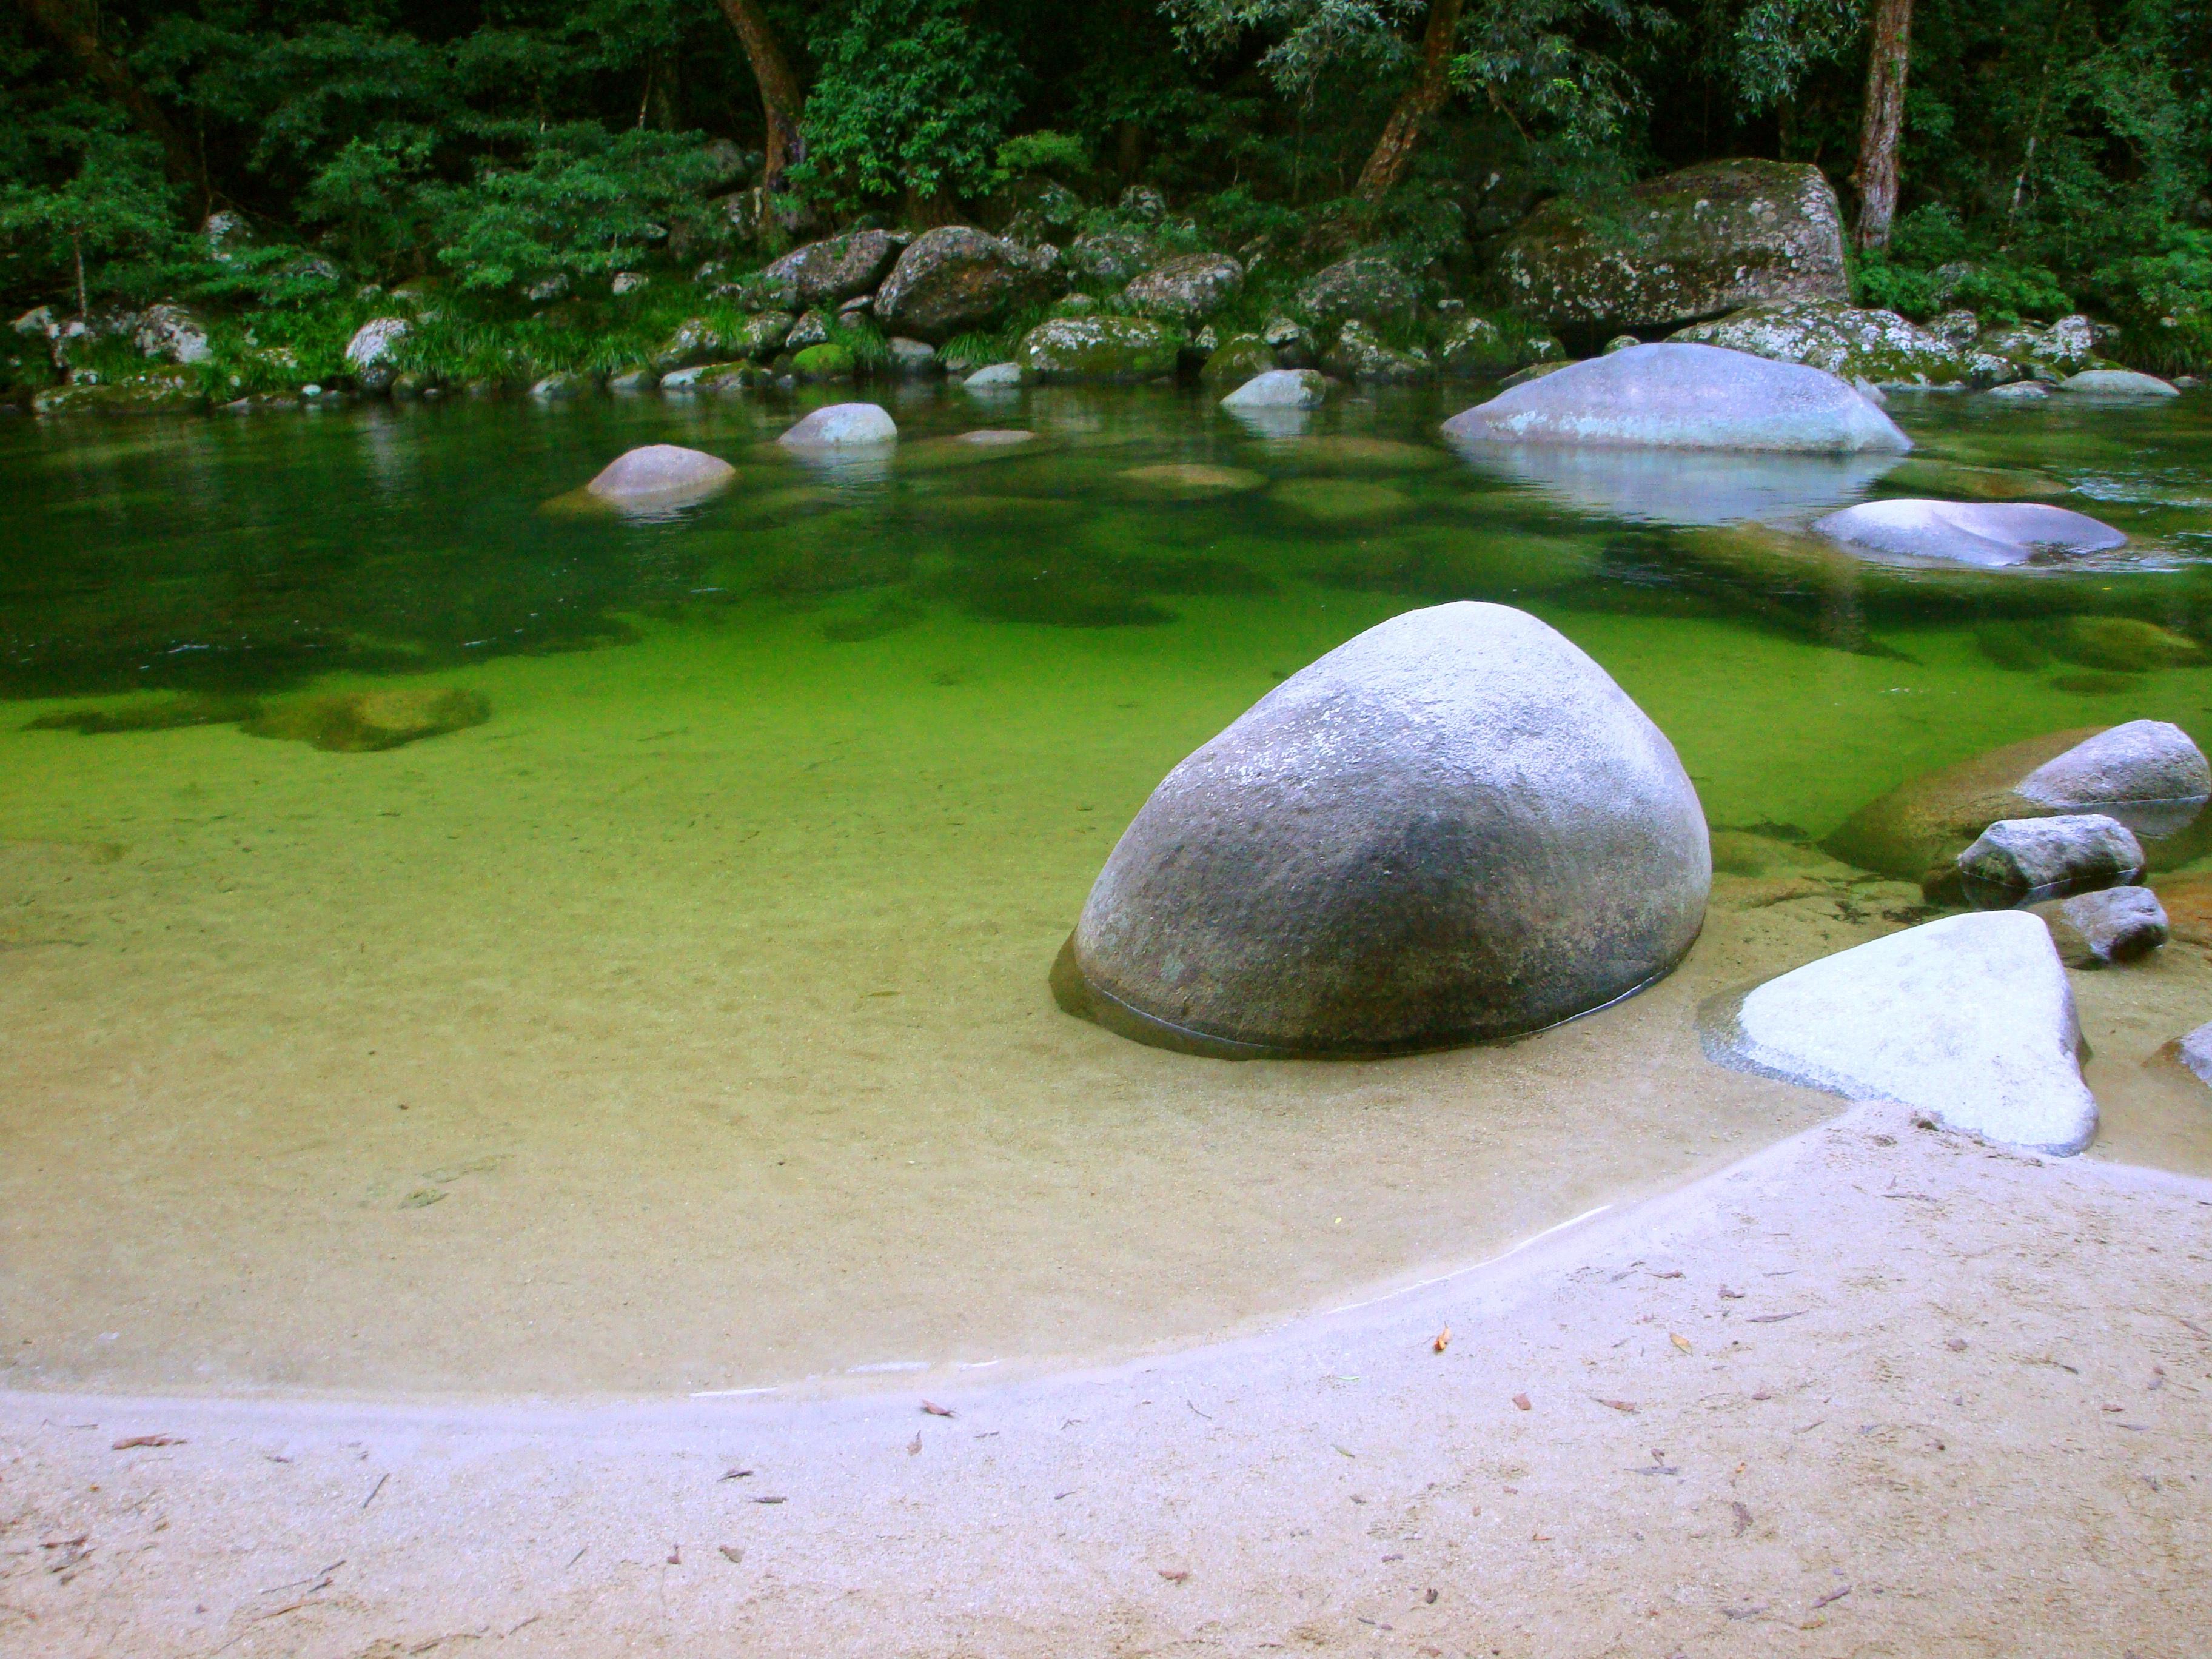 Free Images : landscape, nature, forest, outdoor, rock, light, sun